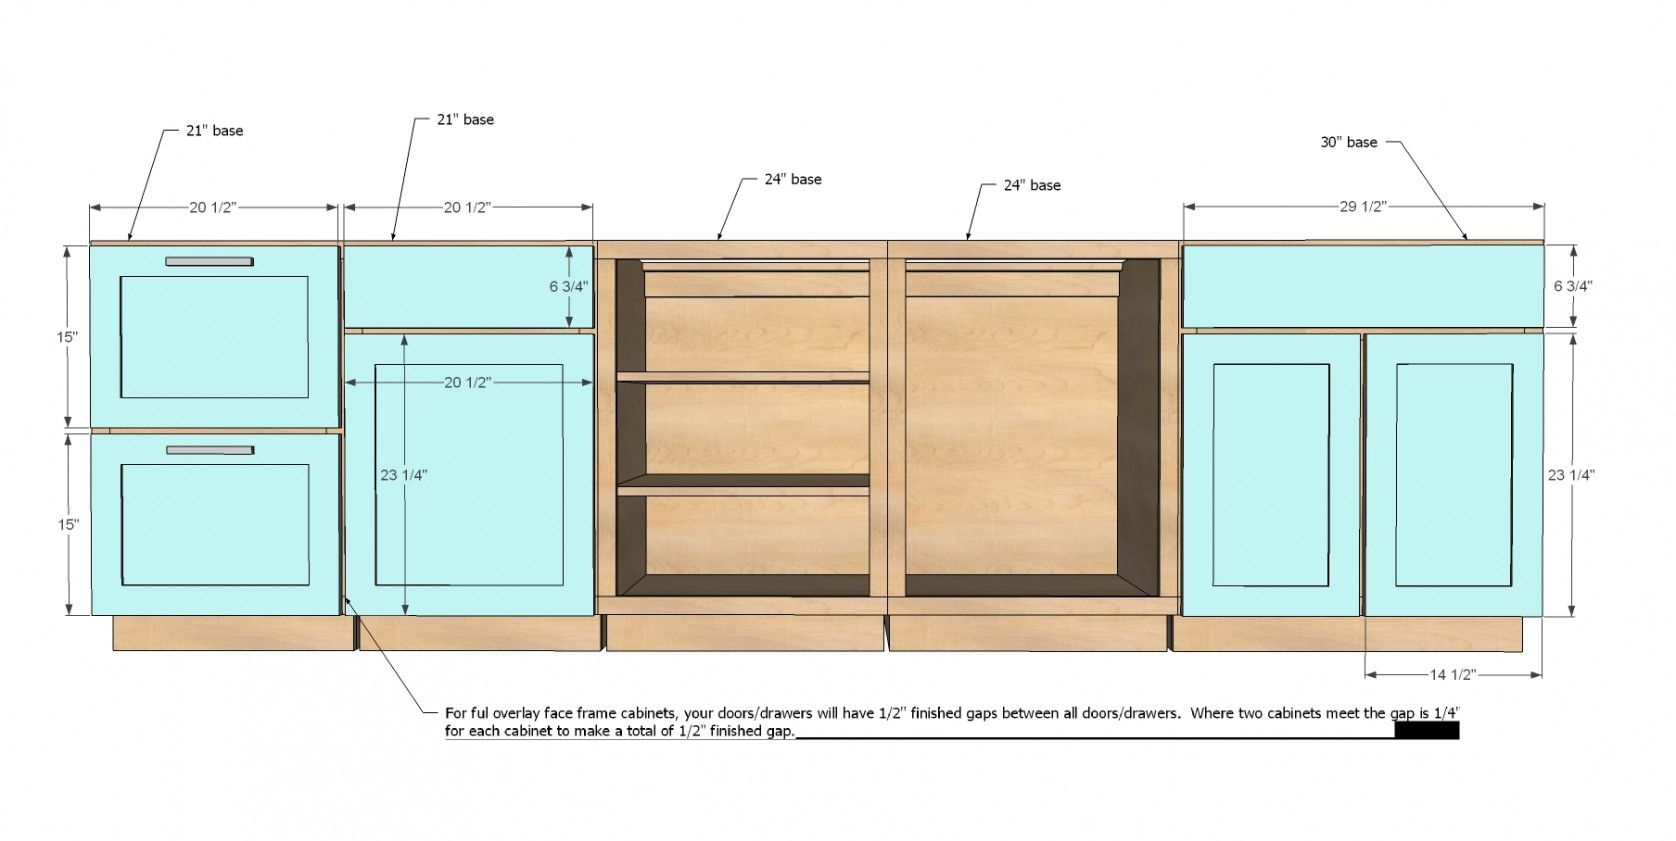 Pin By Rahayu12 On Interior Analogi Kitchen Cabinets